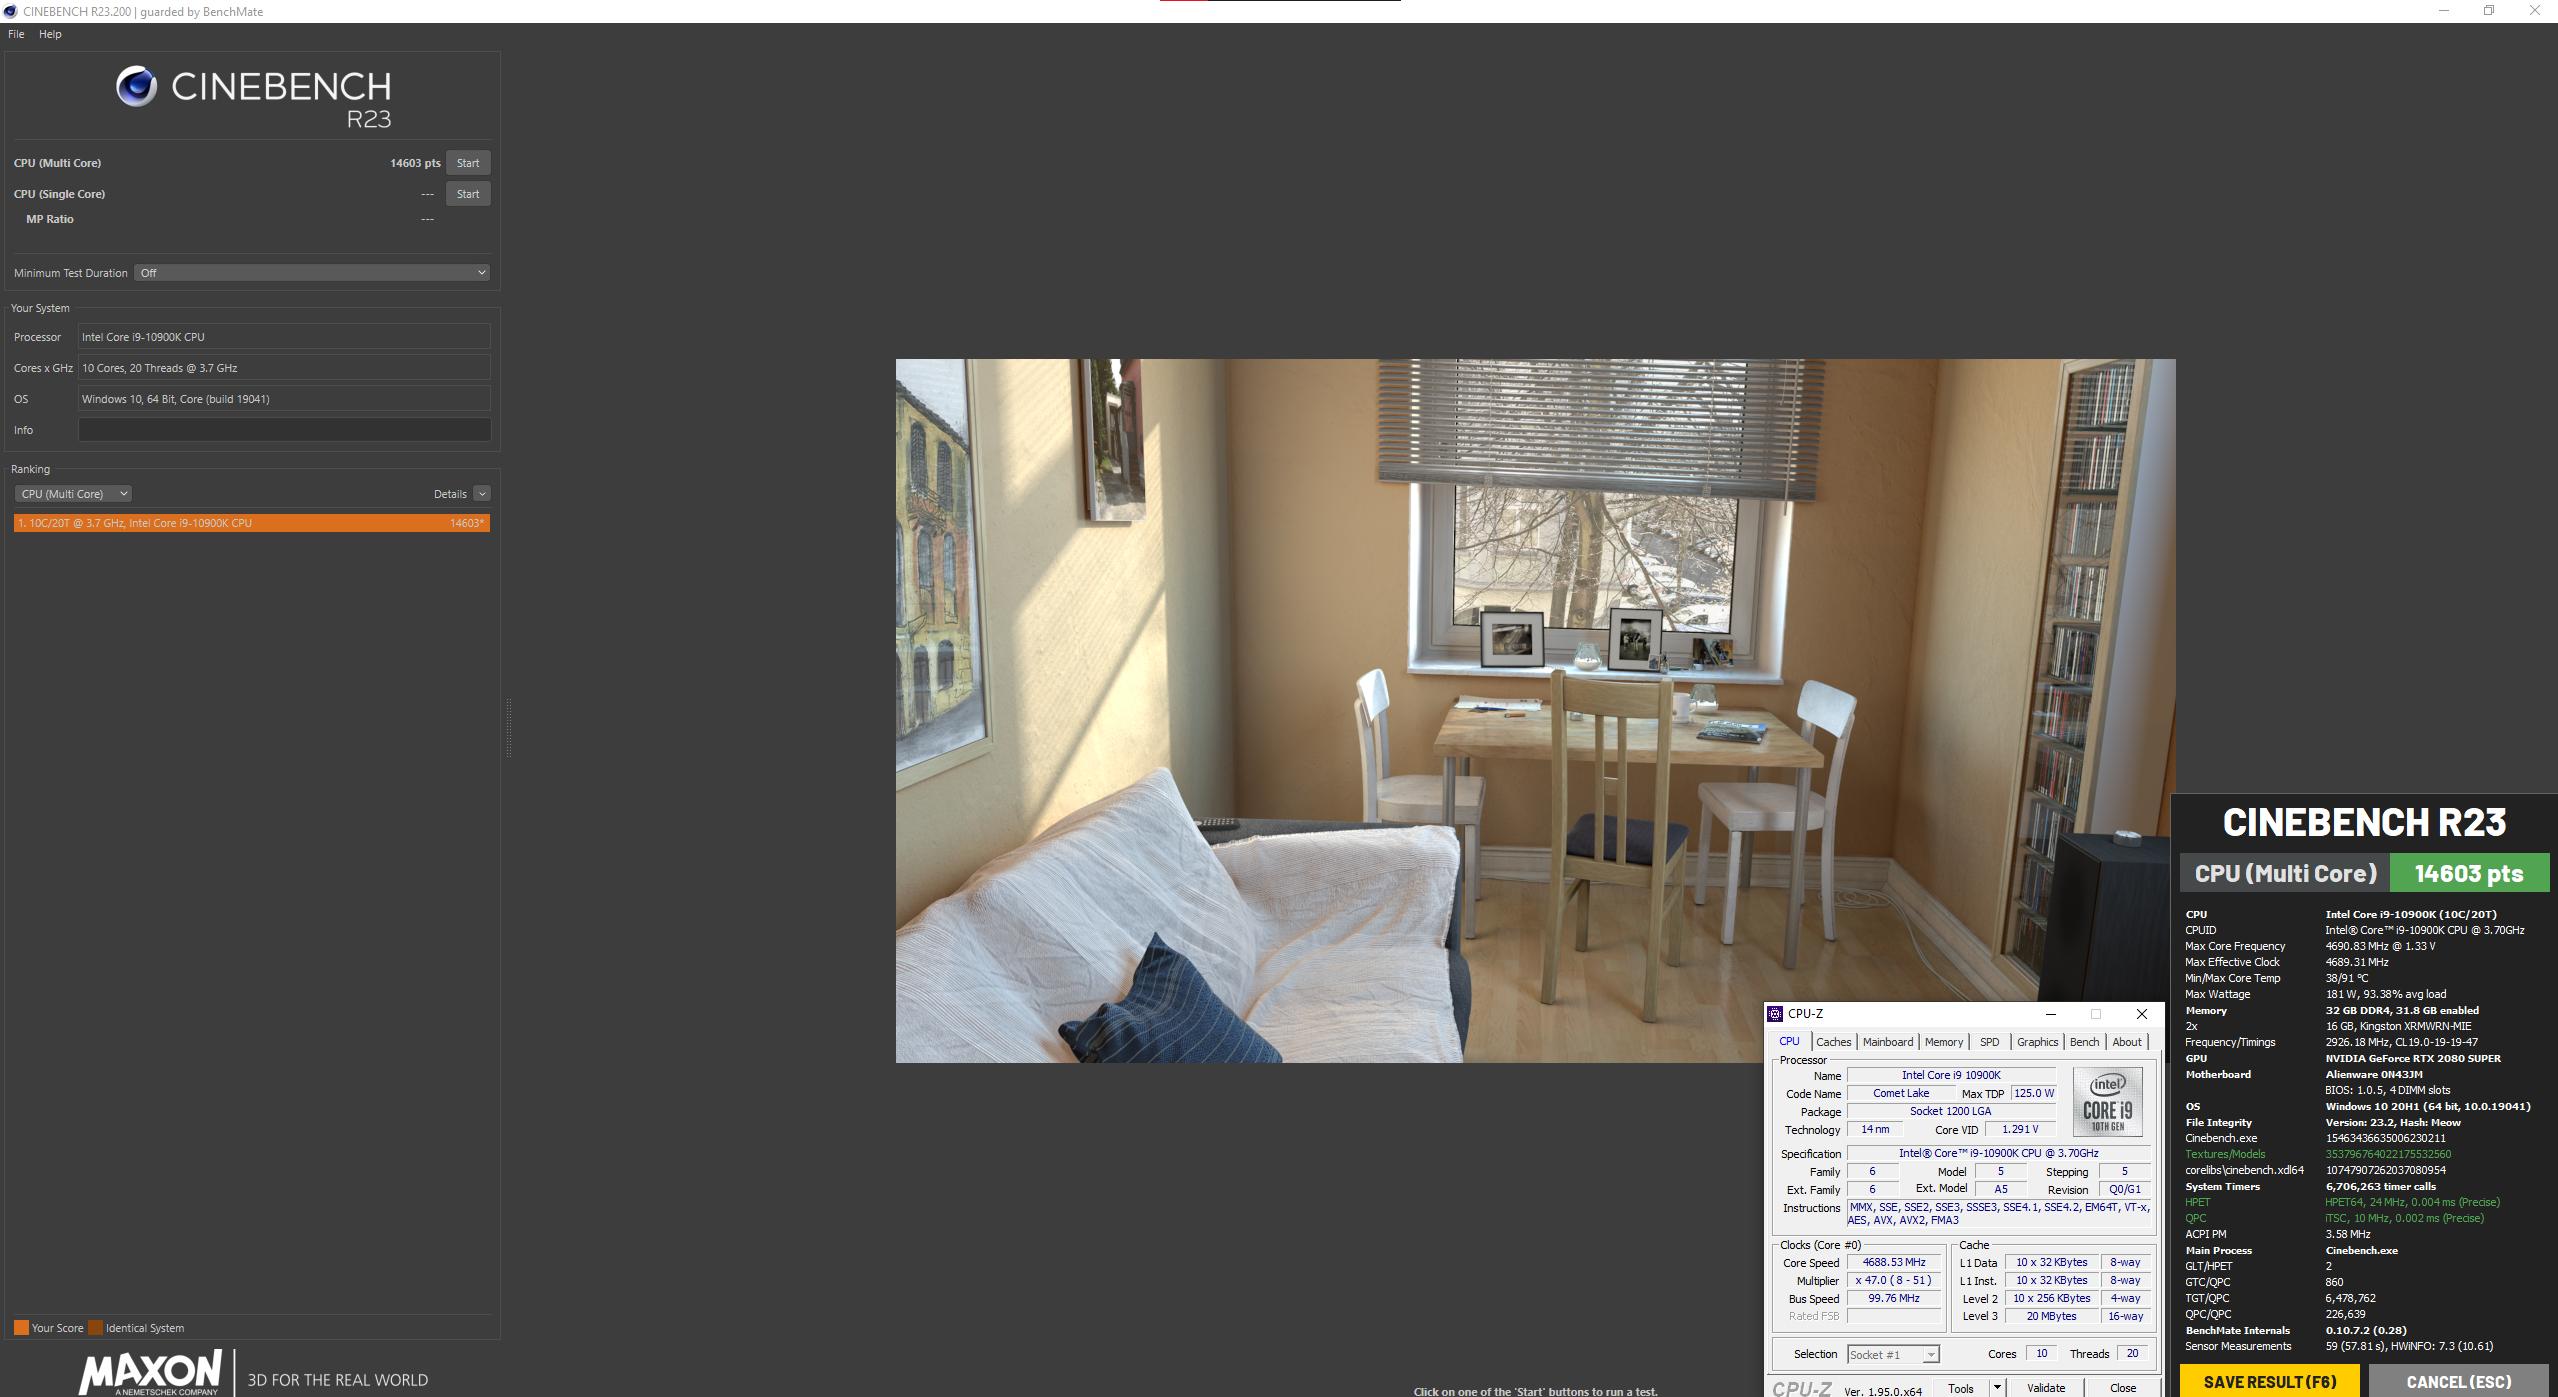 Screenshot 2021-06-23 191153.png